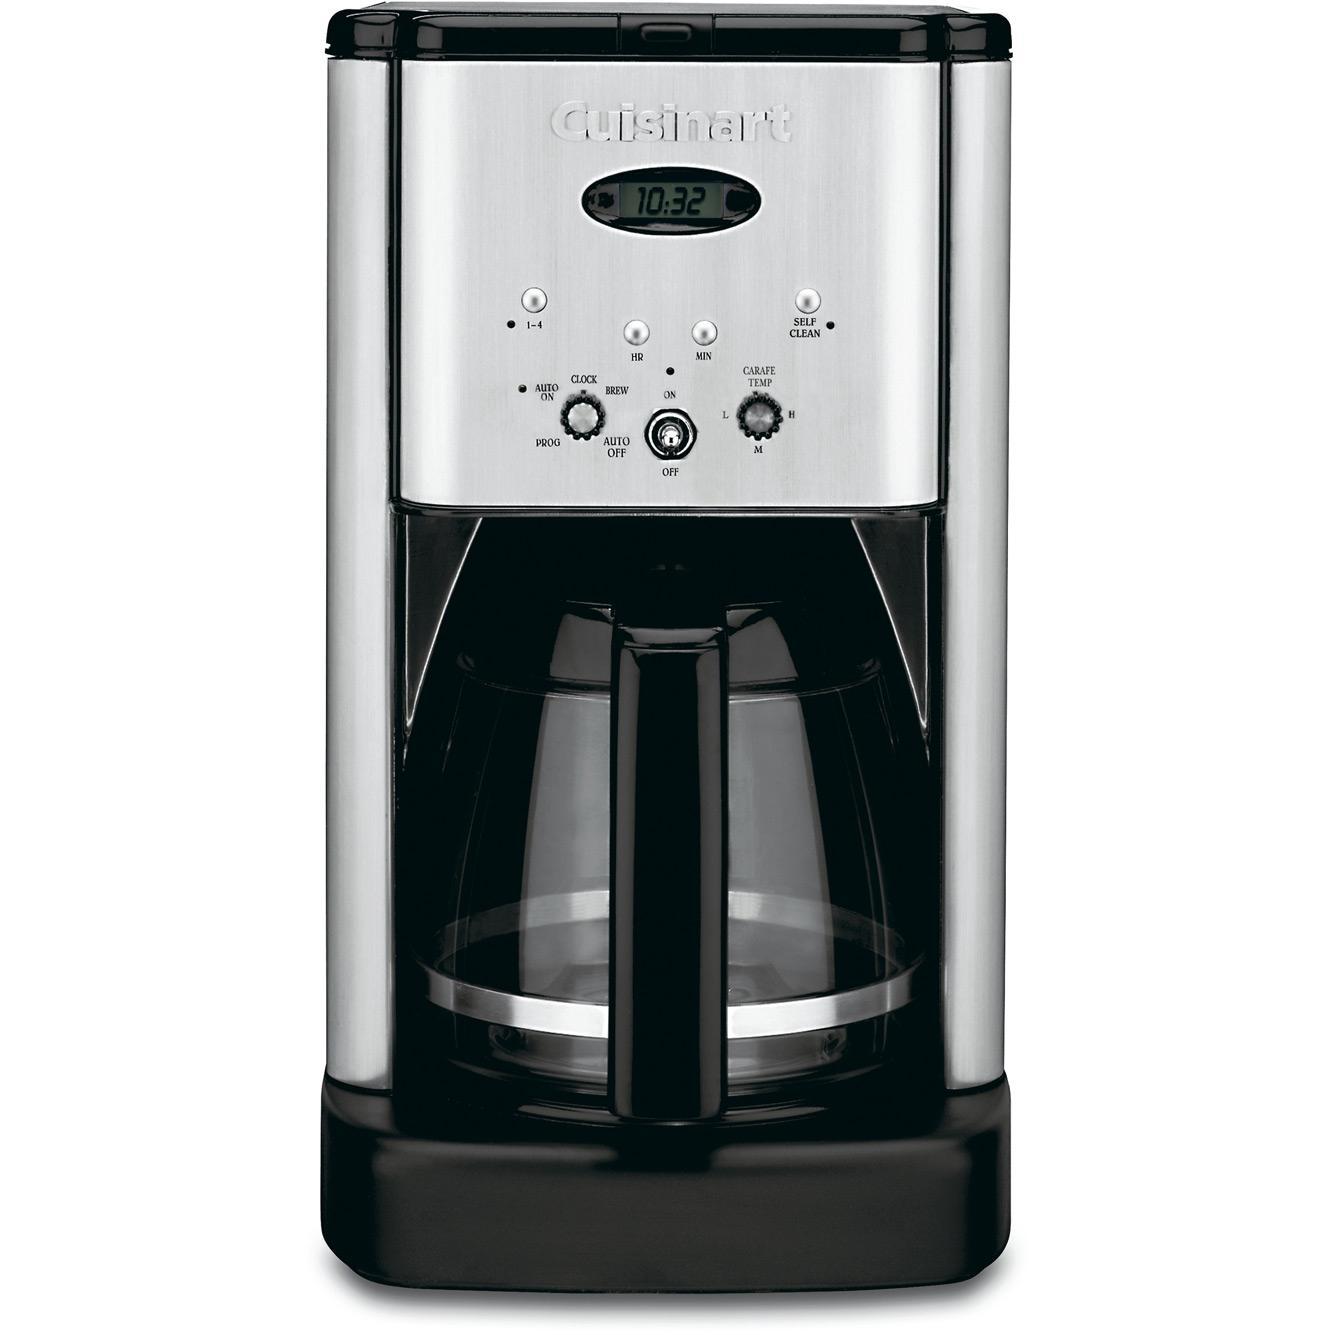 Cuisinart DCC-1200FR Brew Central 12-Cup Coffeemaker, Bru...